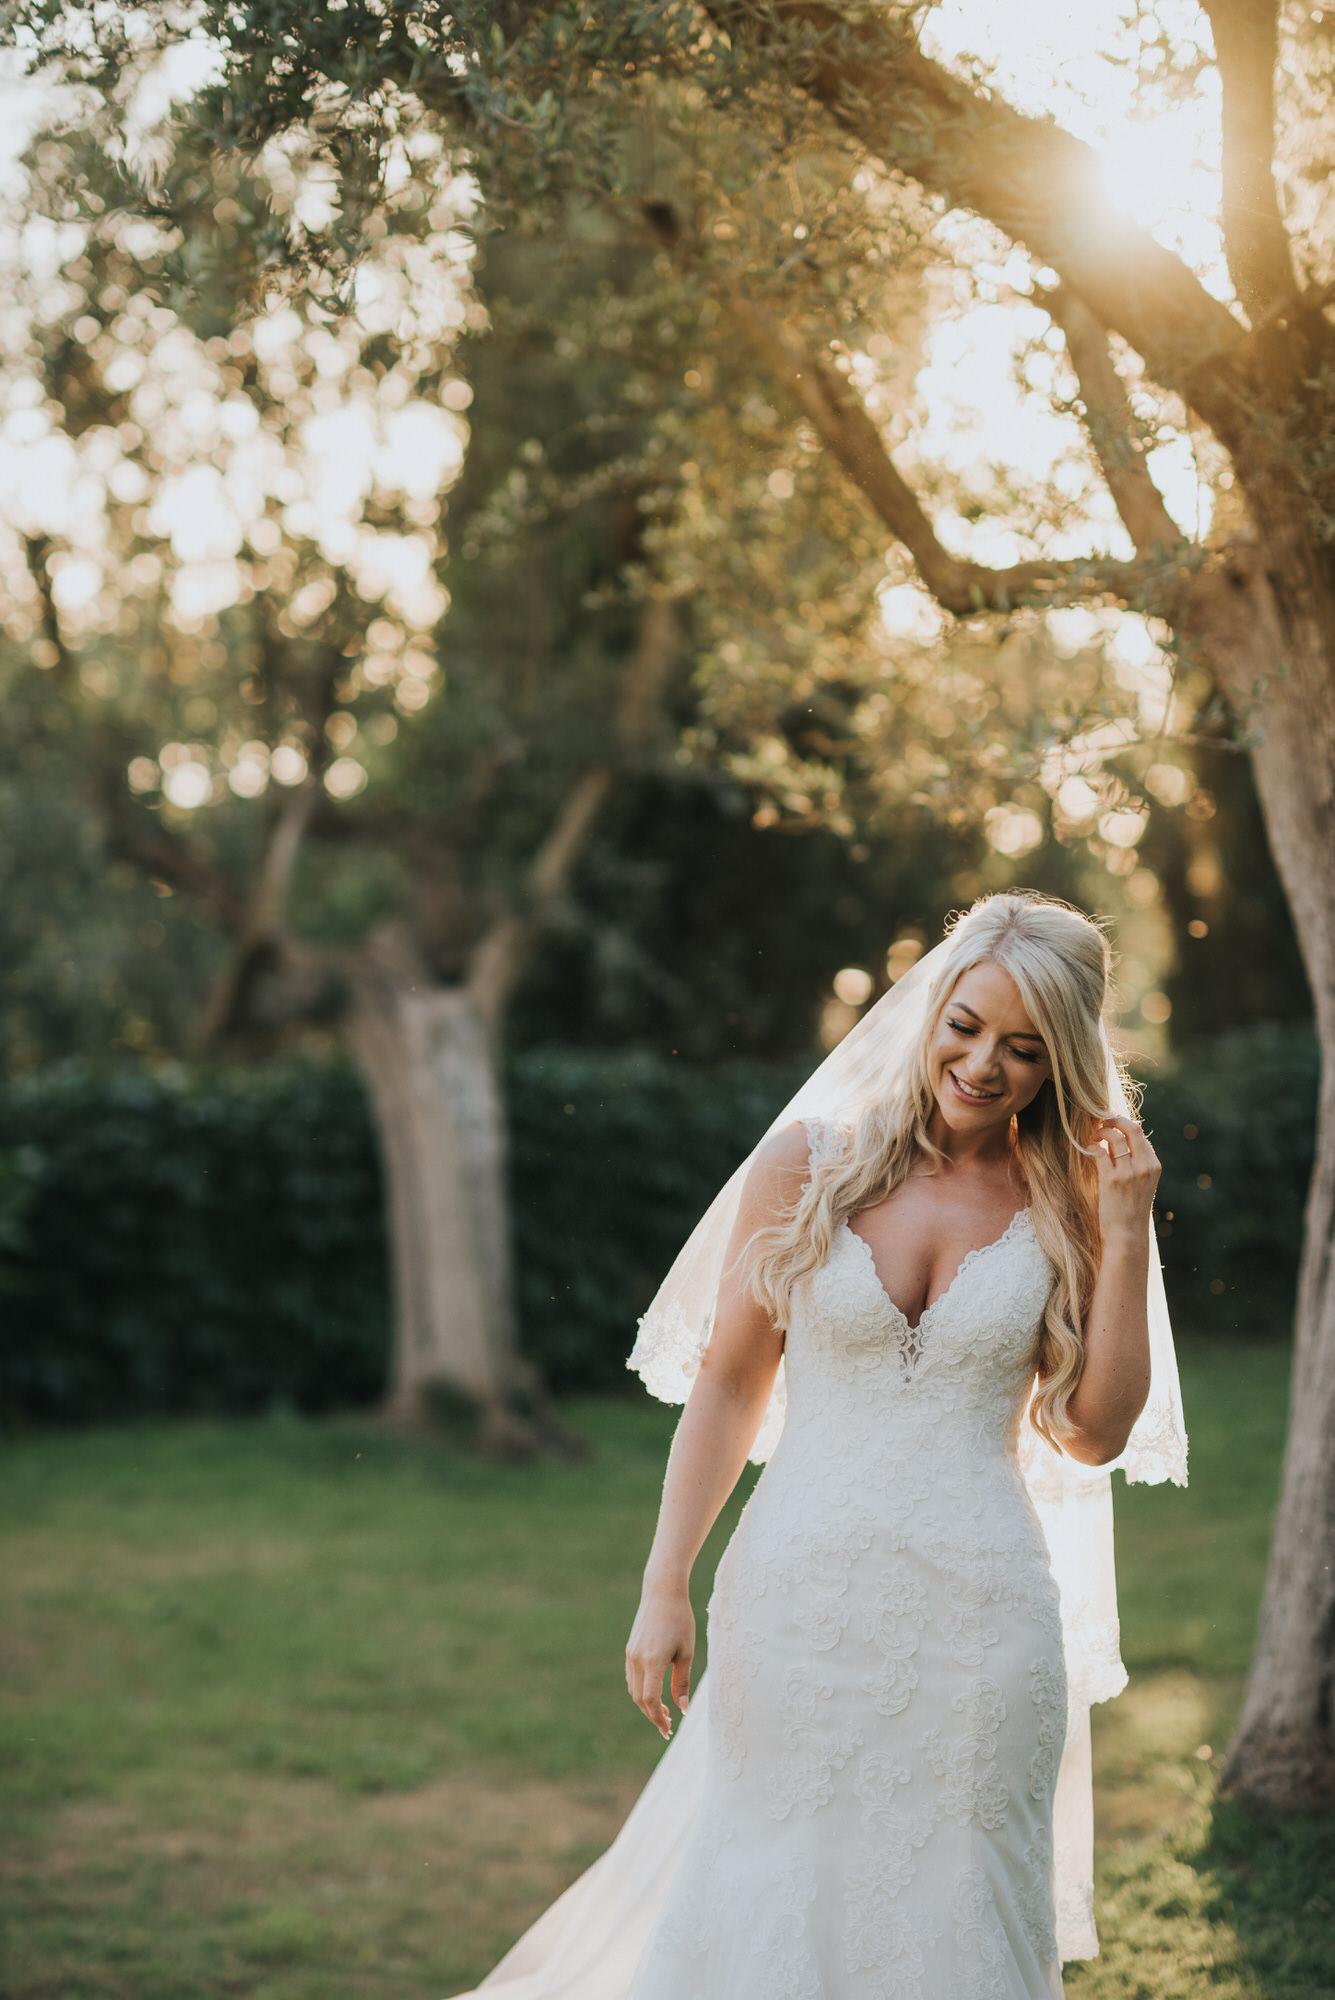 Golden hour bride with veil